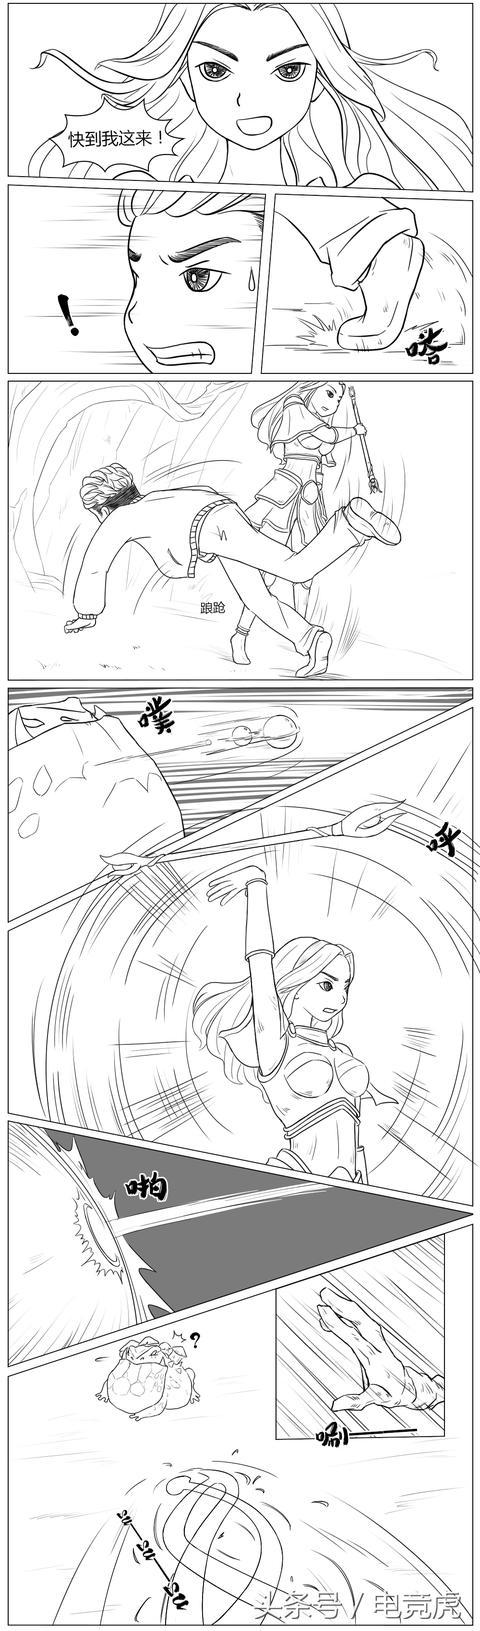 "LOL:漫画回顾MSI,IG和PVB对于G2的夺冠""一脸懵逼""!"